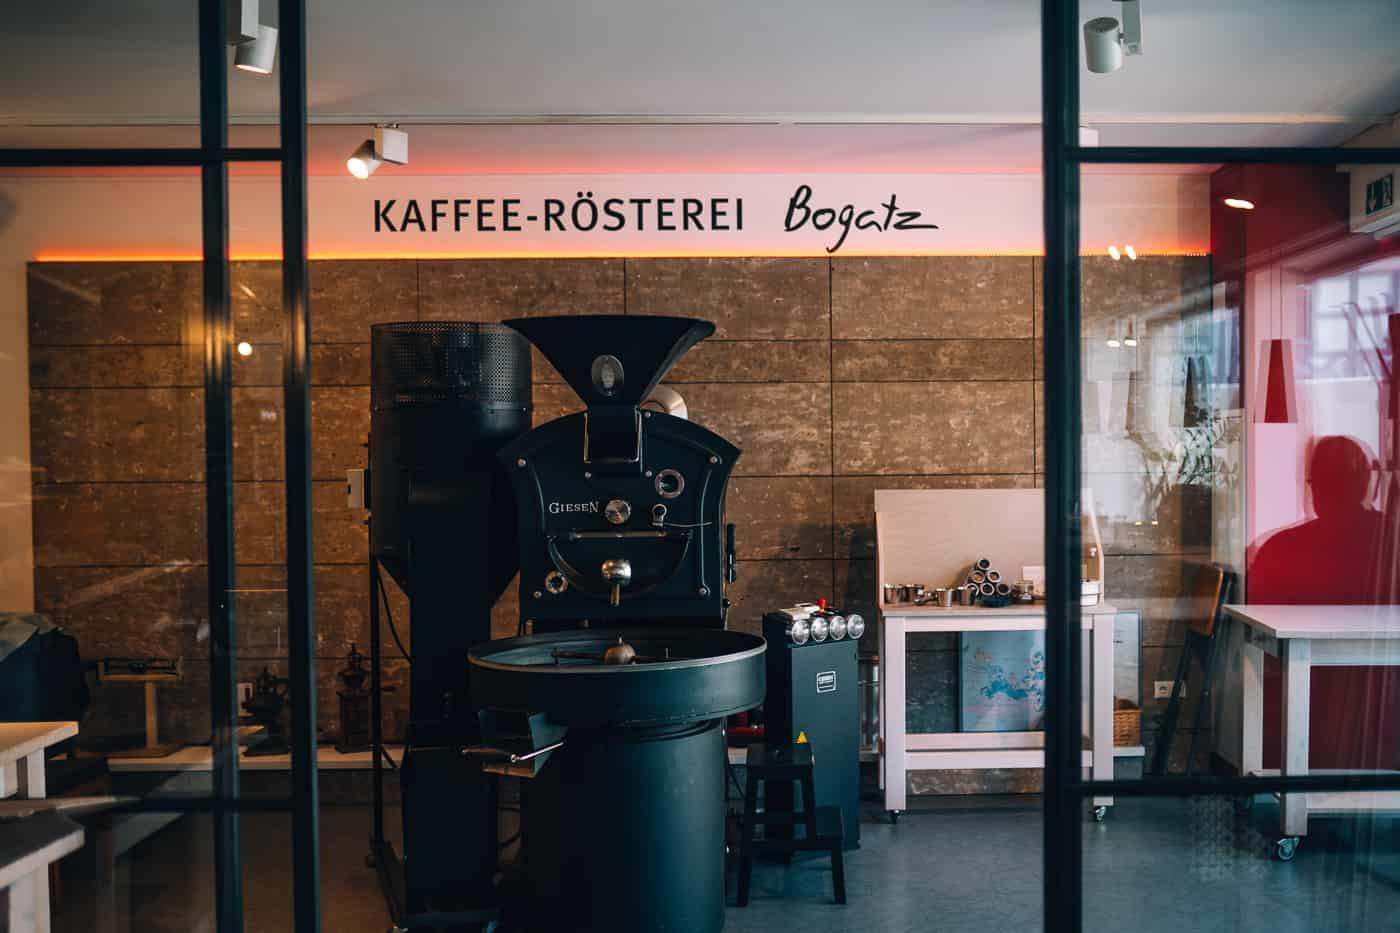 Forchheim in Oberfranken - Kaffee-Rösterei Bogatz